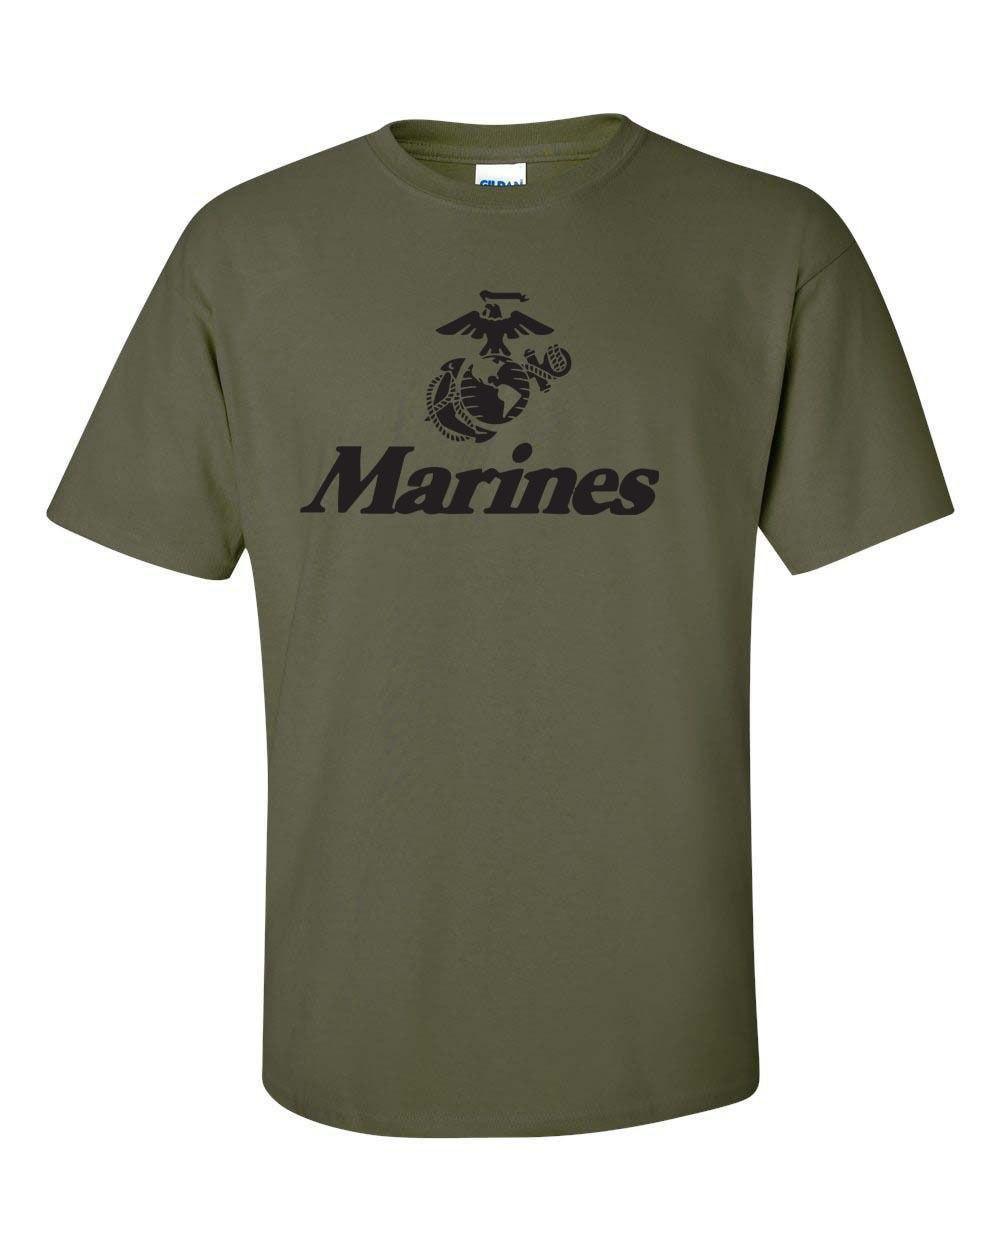 b04767f0d93e8d 2018 Fashion Cotton T-shirt Marine Corps U.S. United States Marines USMC  Military Men s Tee